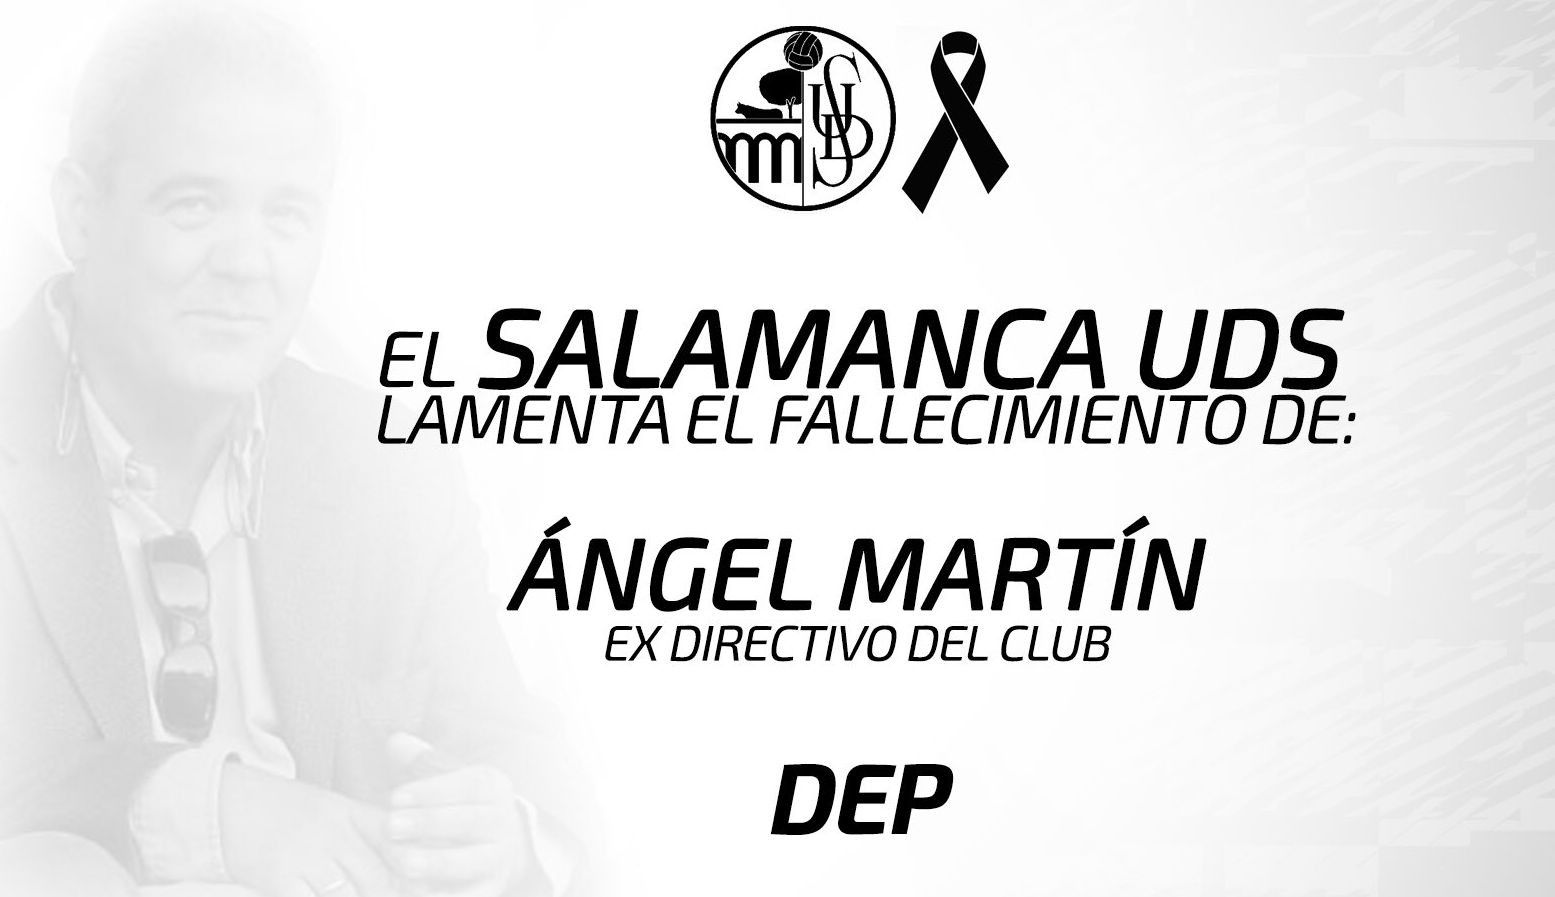 ANGEL MARTIN